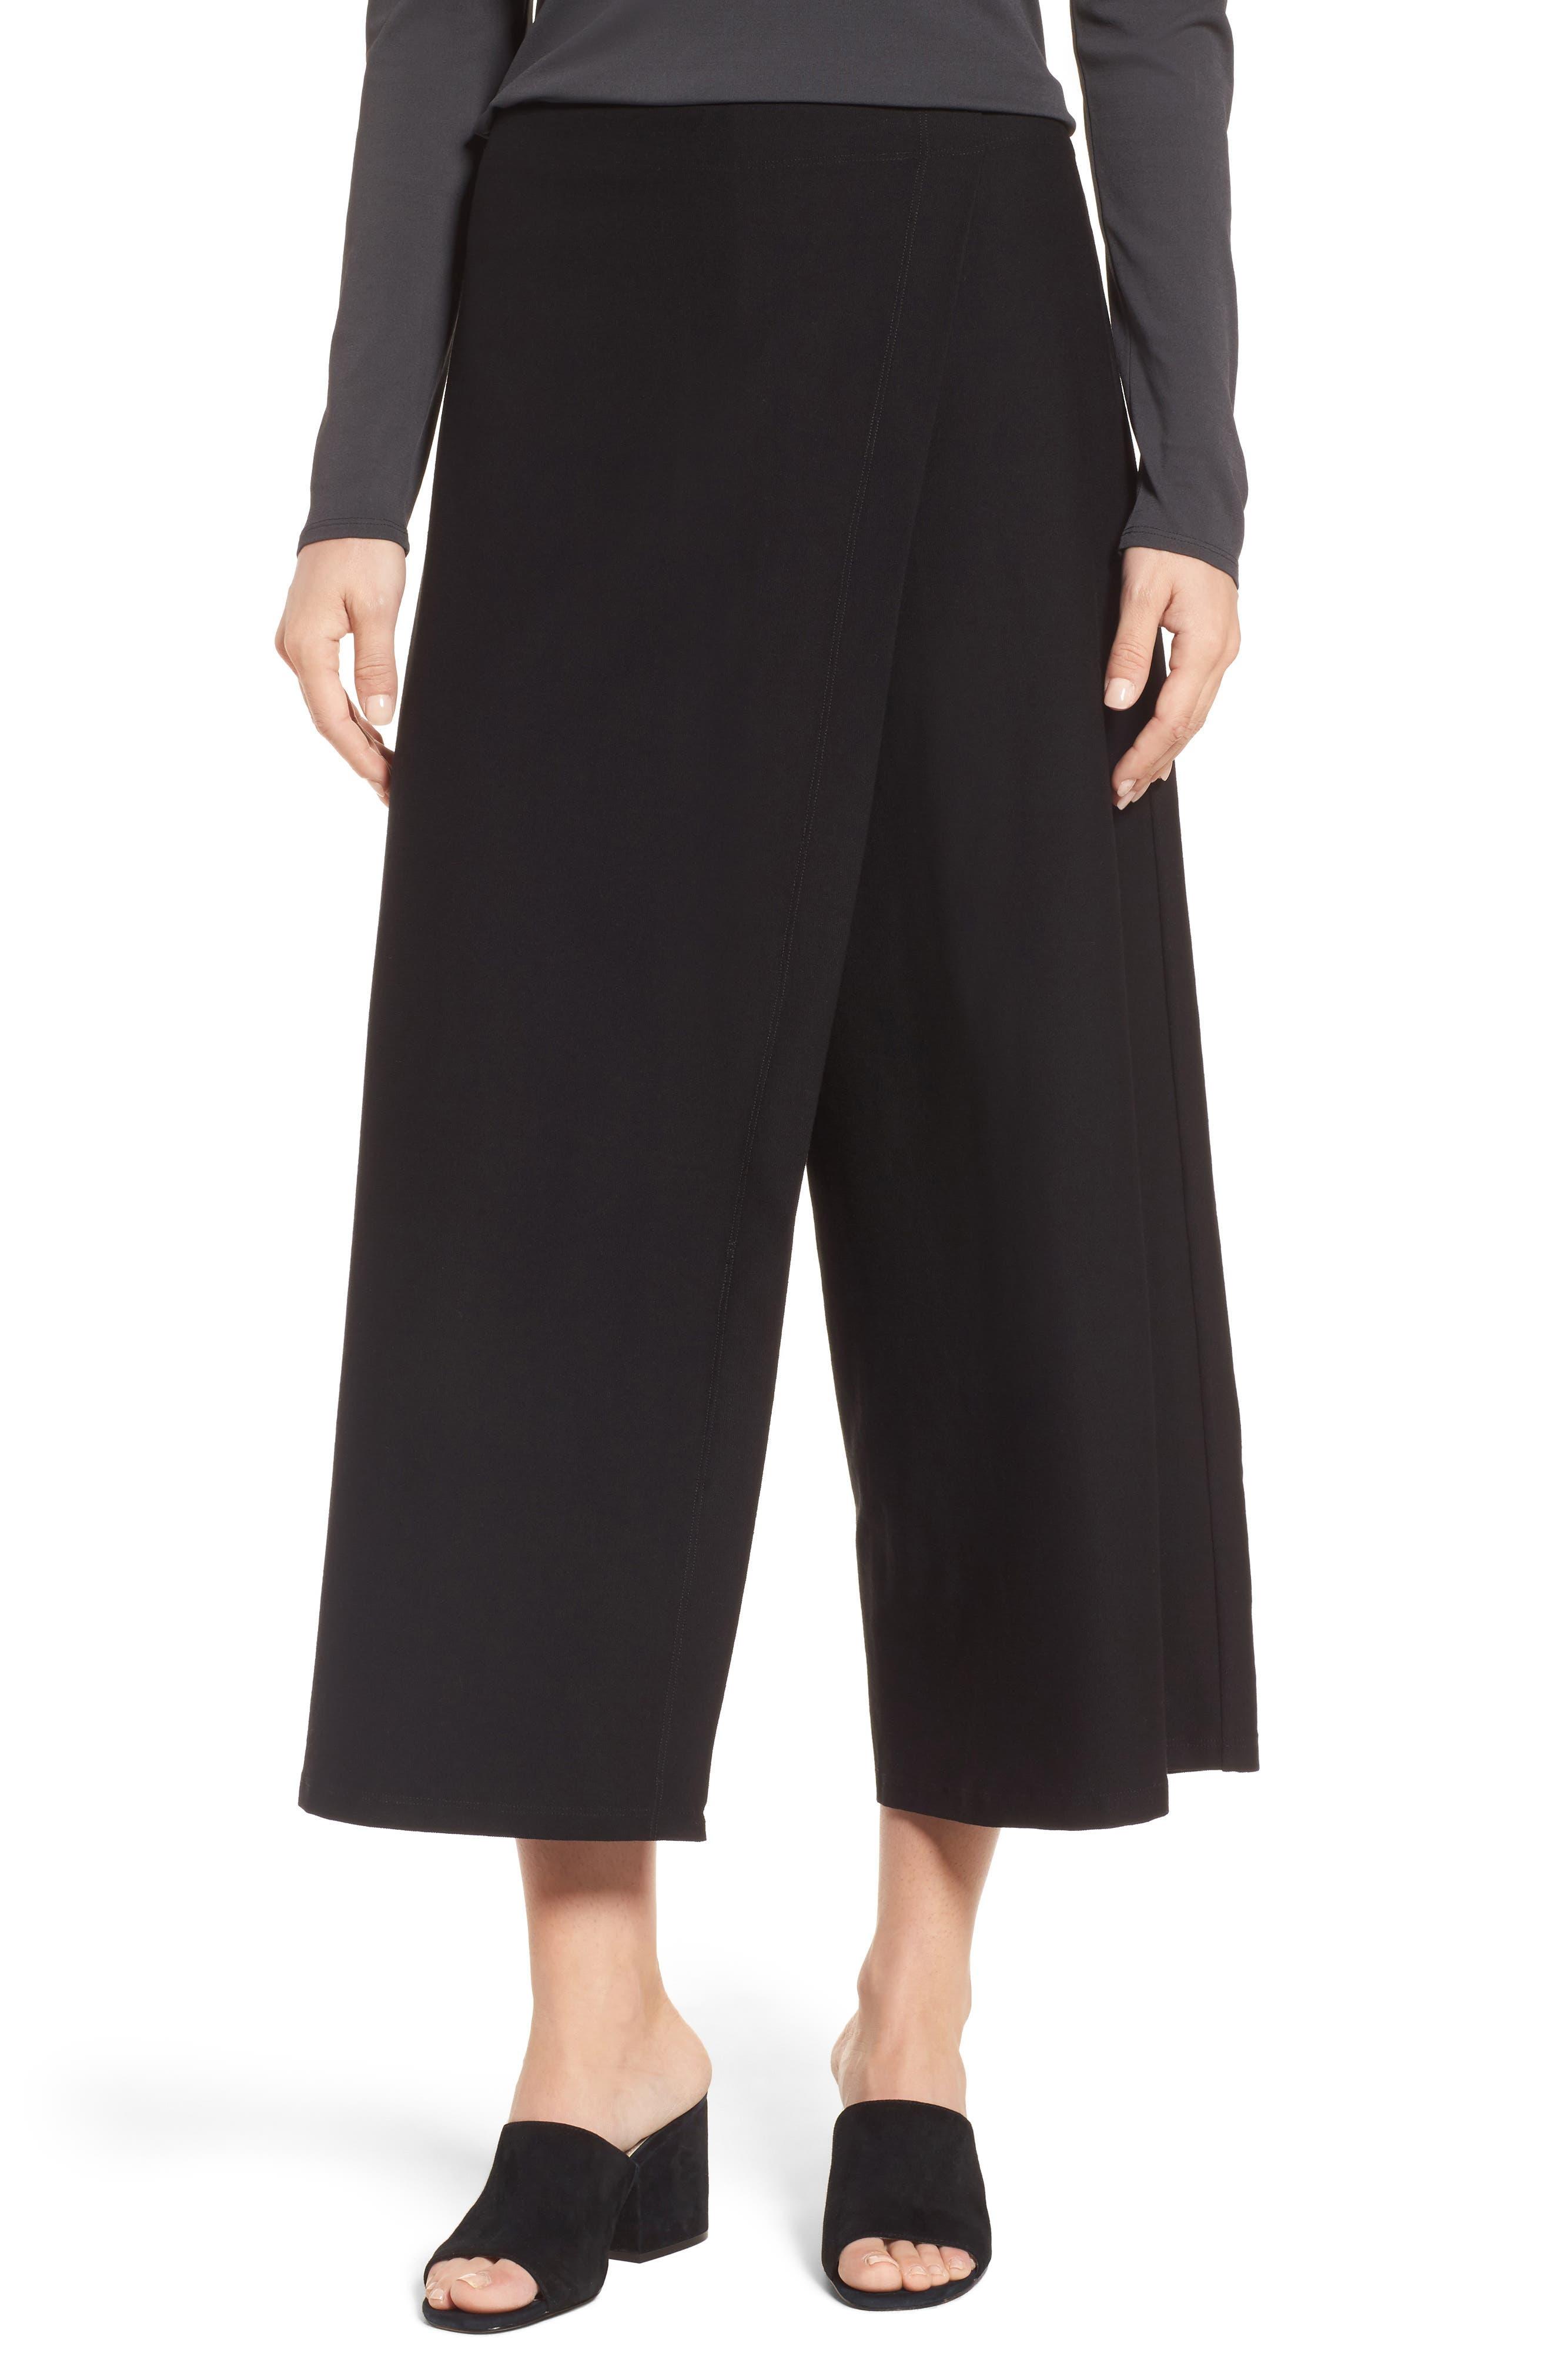 Main Image - Eileen Fisher Crop Stretch Knit Pants (Regular & Petite)